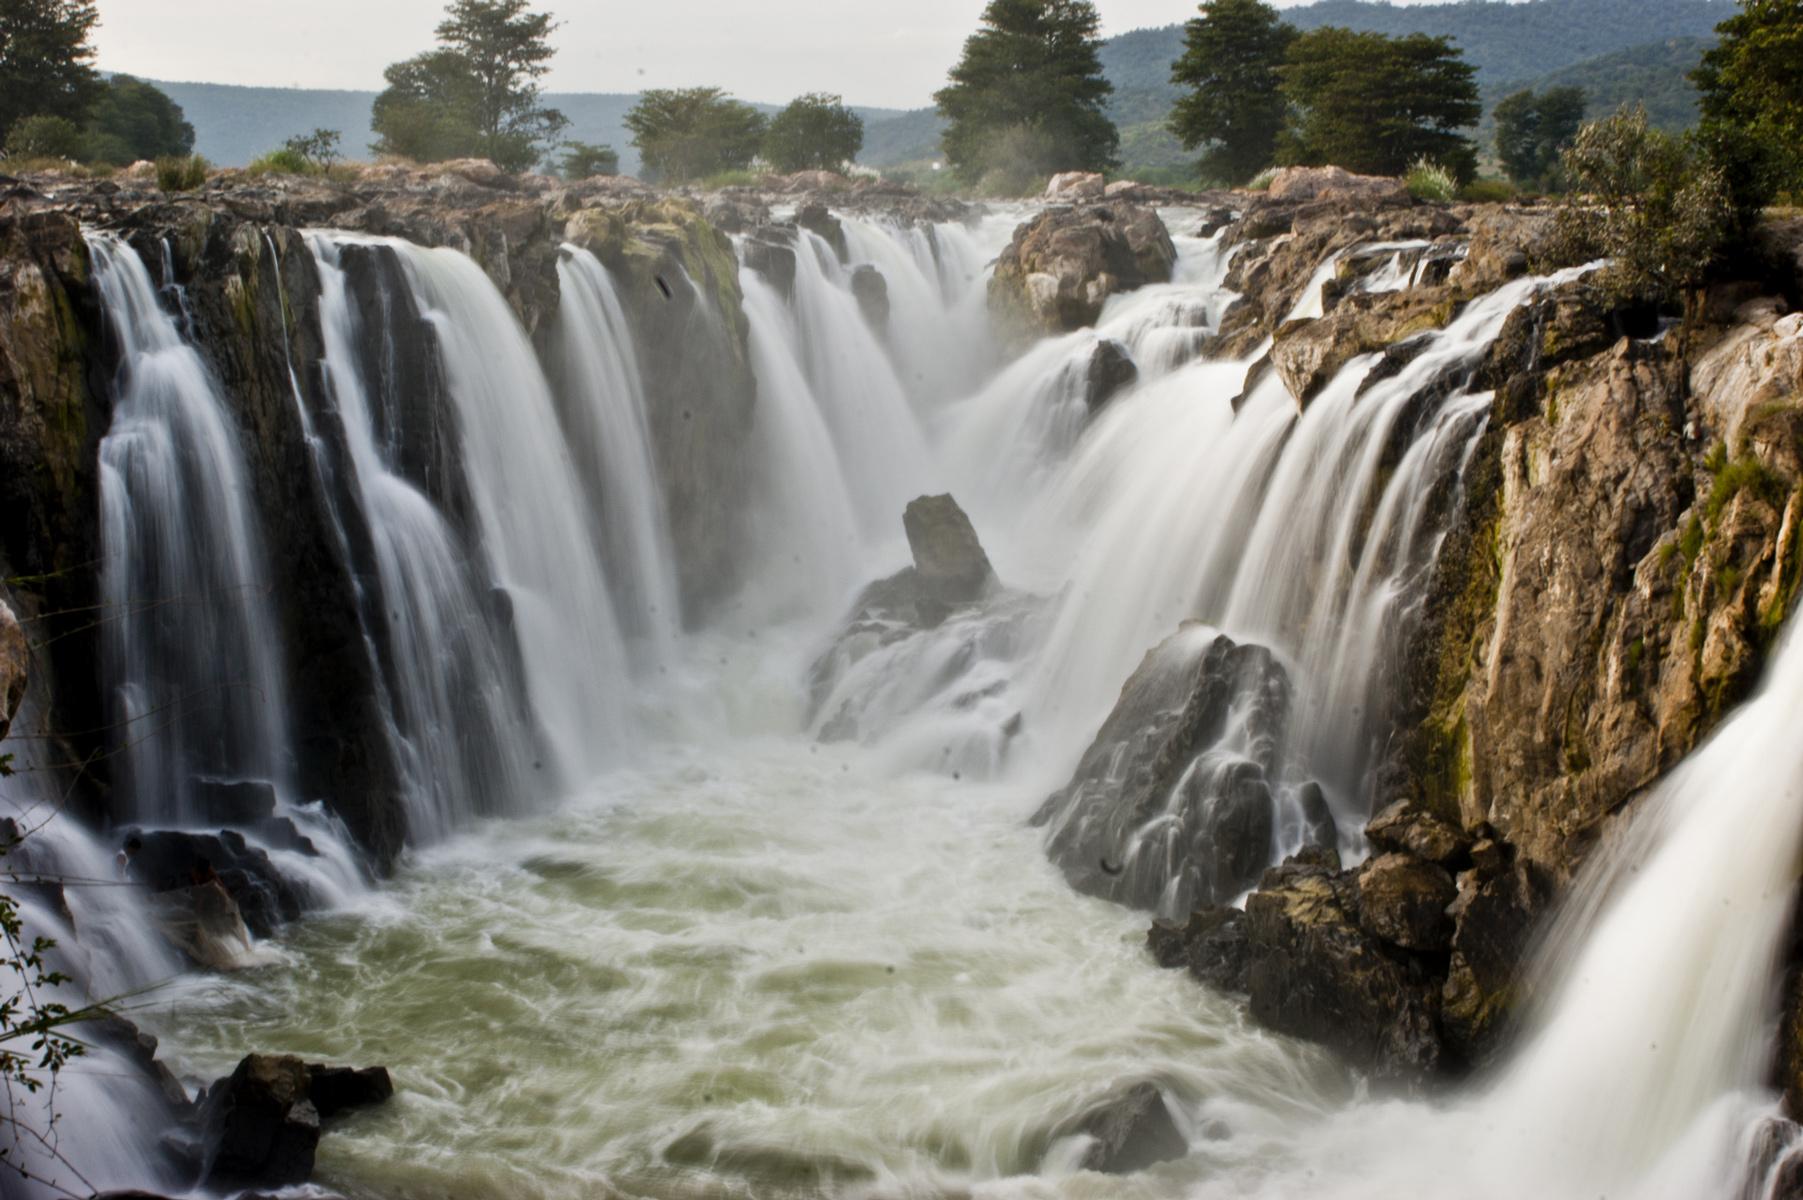 Hogenakkal Falls in TamilNadu | © Ezhuttukari/WikiCommons